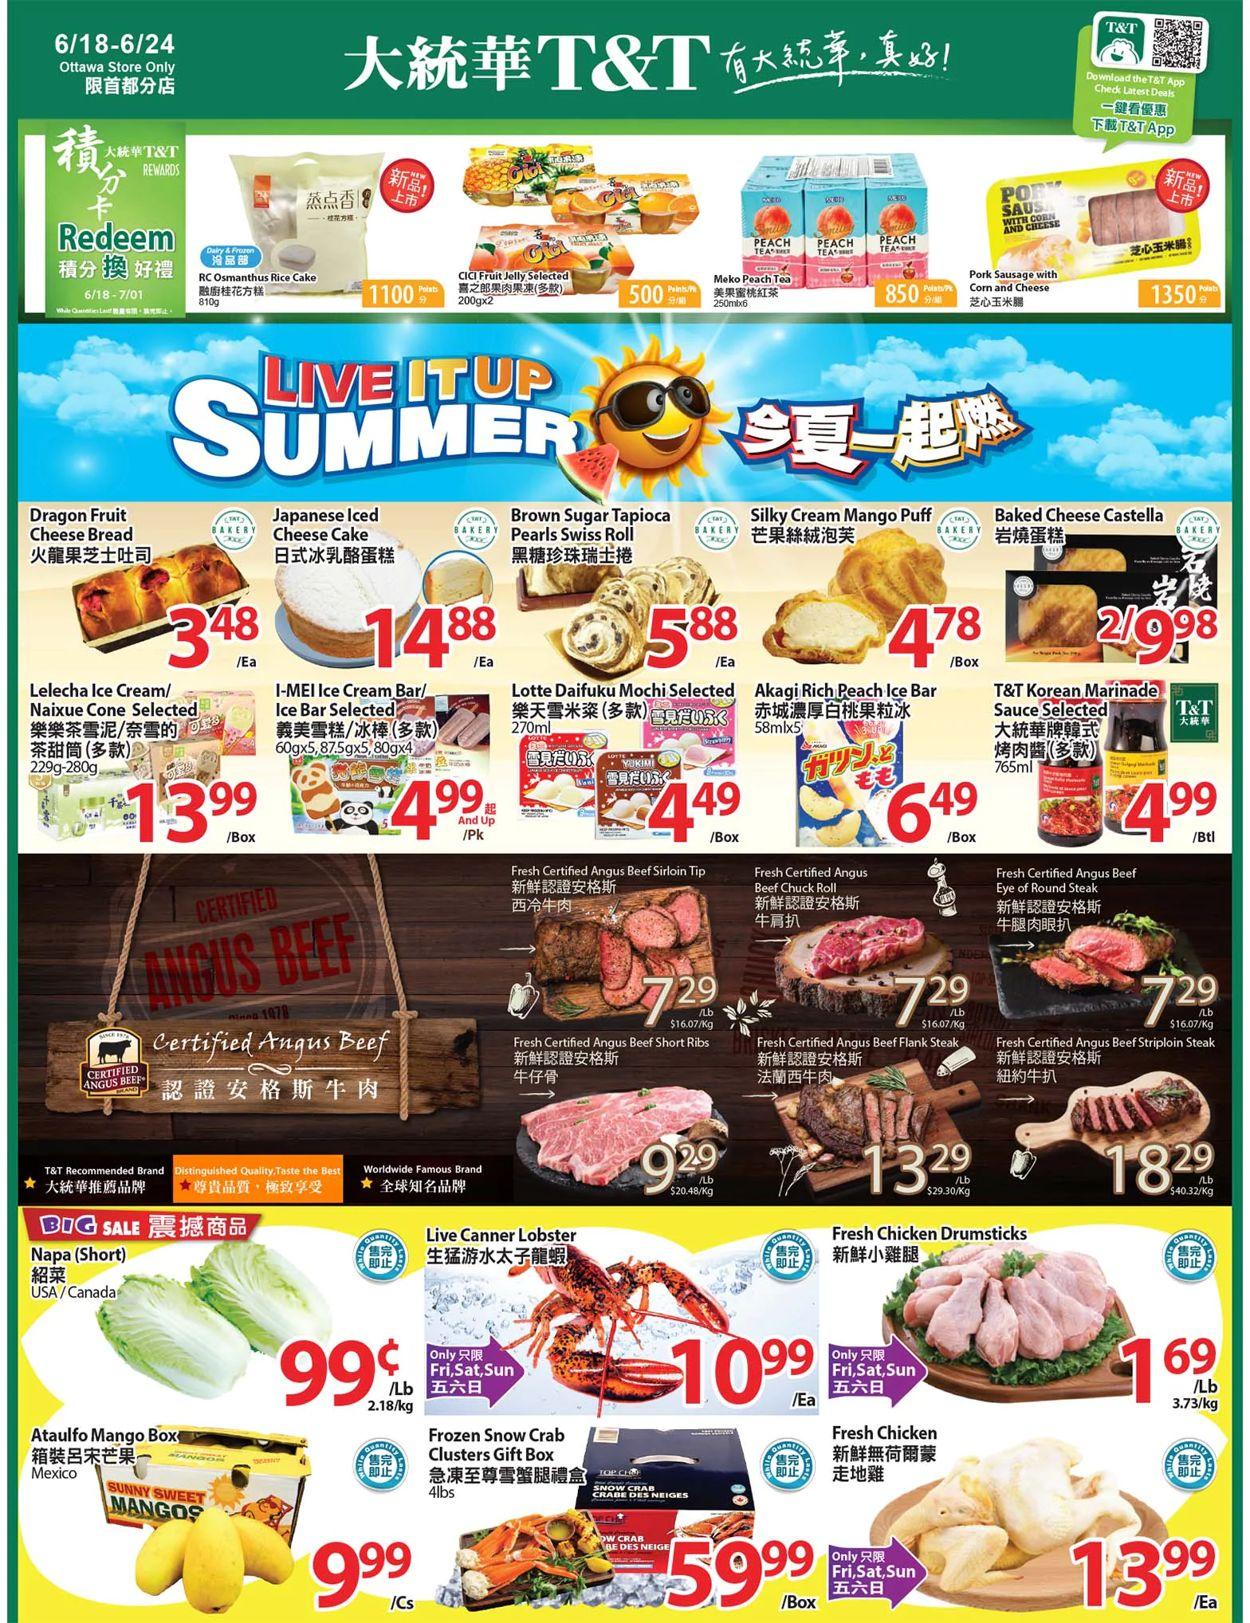 T&T Supermarket - Ottawa Flyer - 06/18-06/24/2021